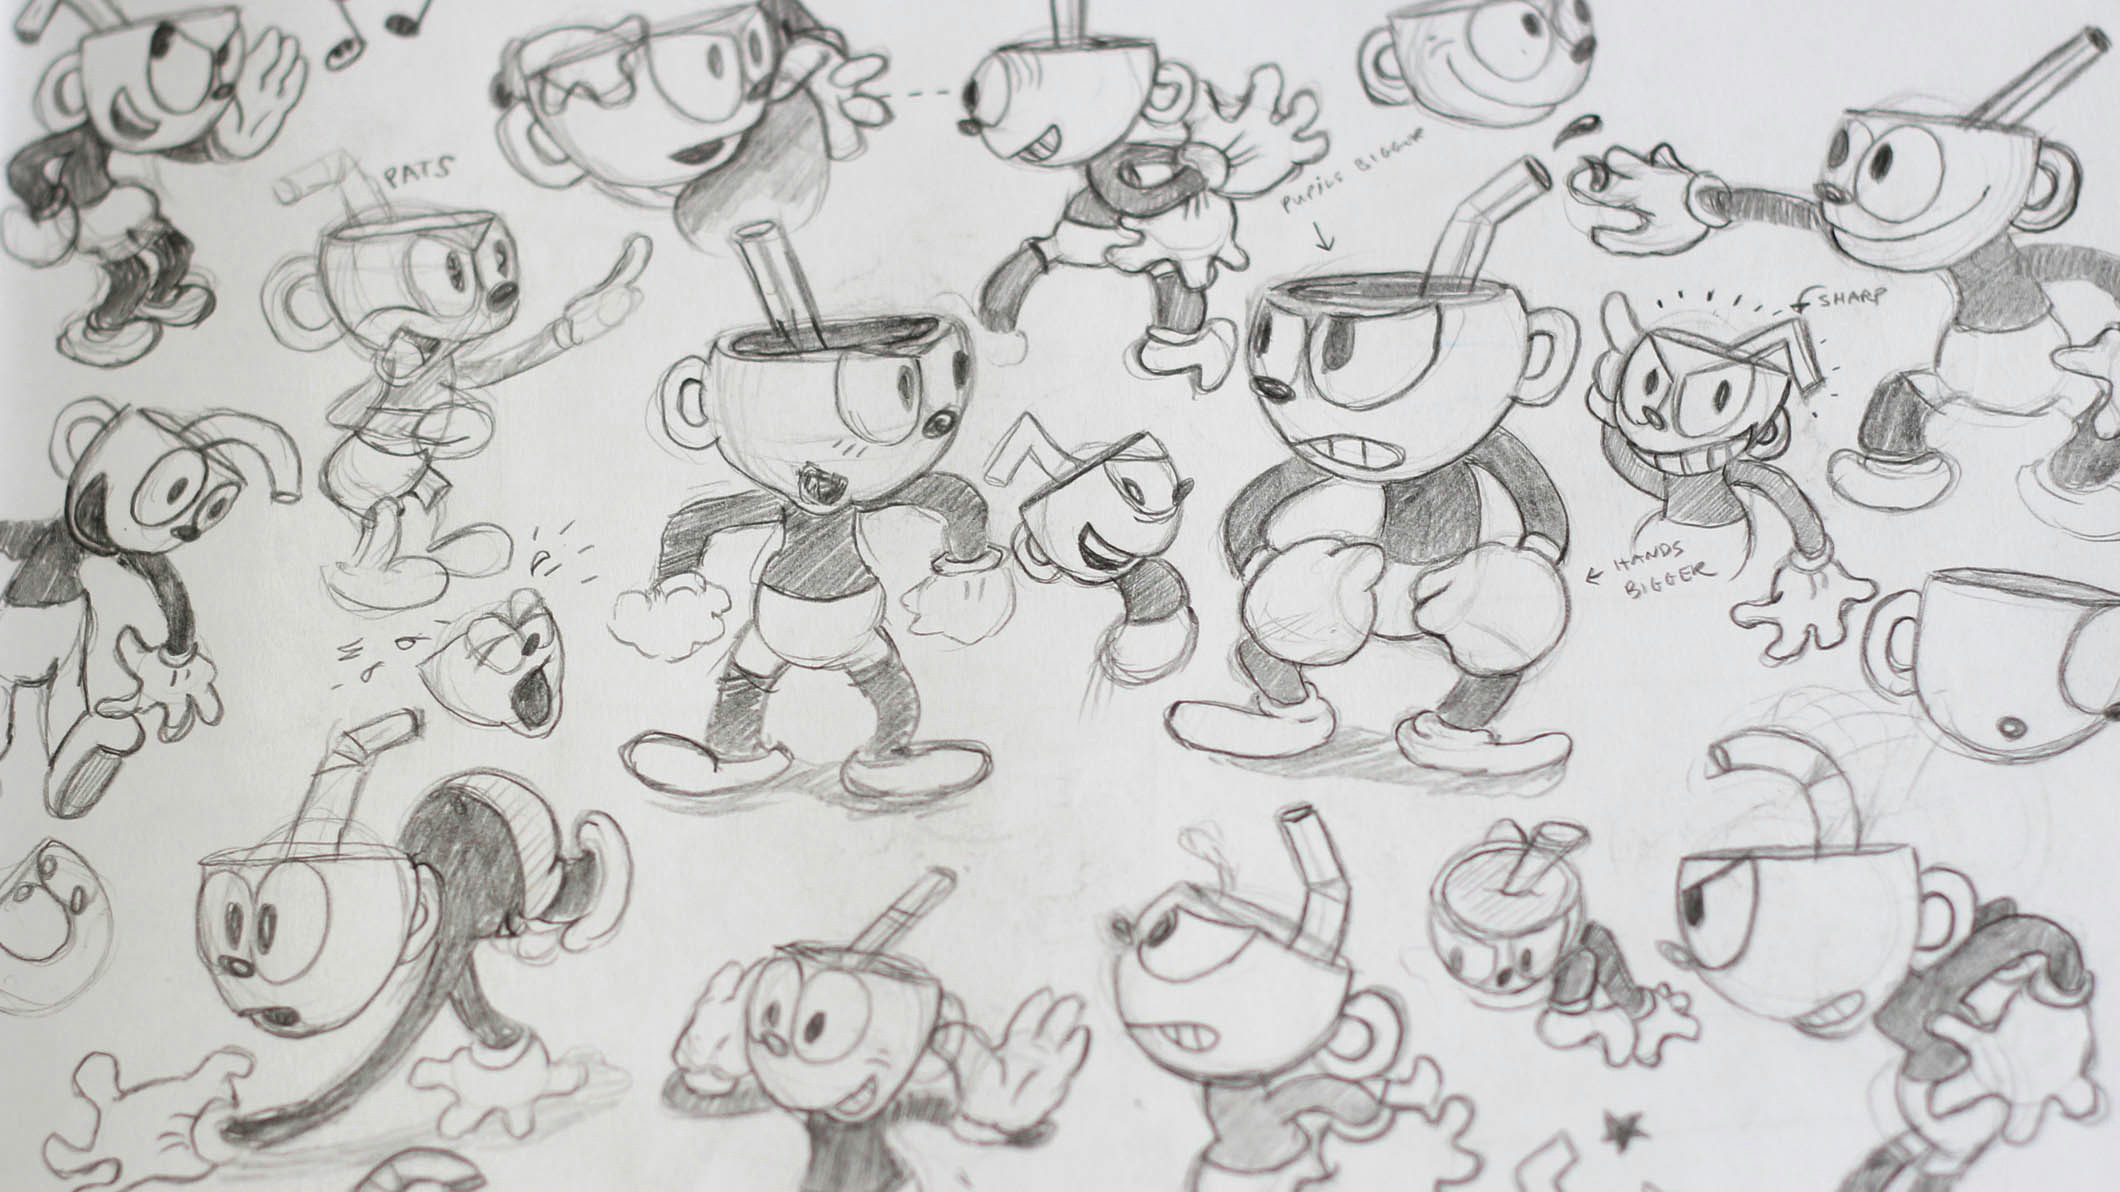 cuphead sketch 2 png